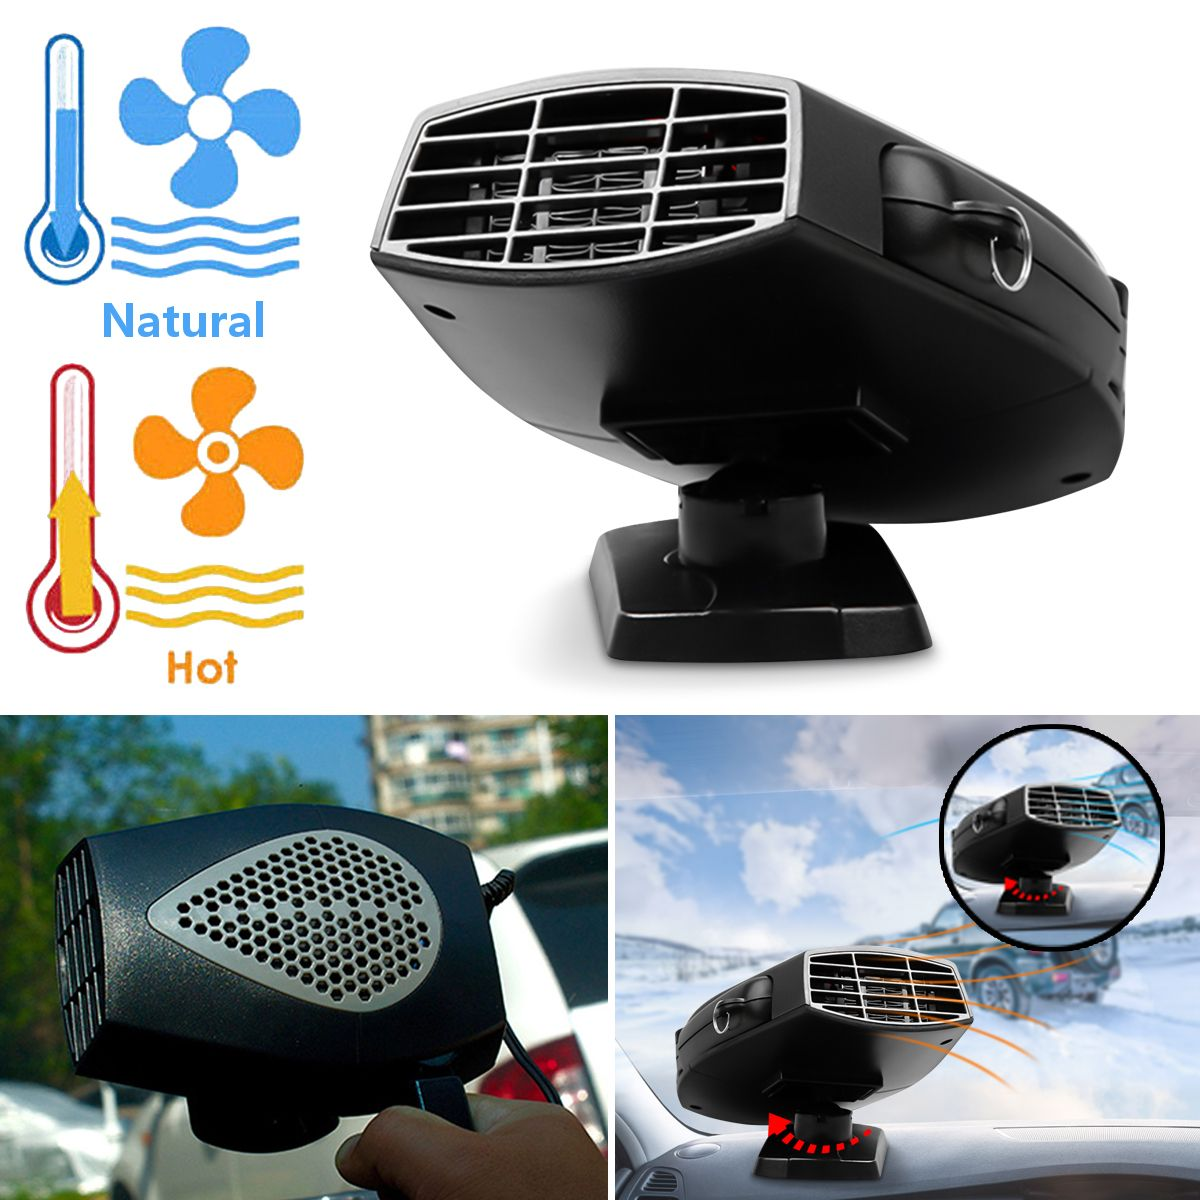 150 watt 12 v Tragbare Auto Lkw Fahrzeug Elektrische Air Fan Auto Heizung Heizung Fan Auto Windschutzscheibe Windows Trockner Defroster demister